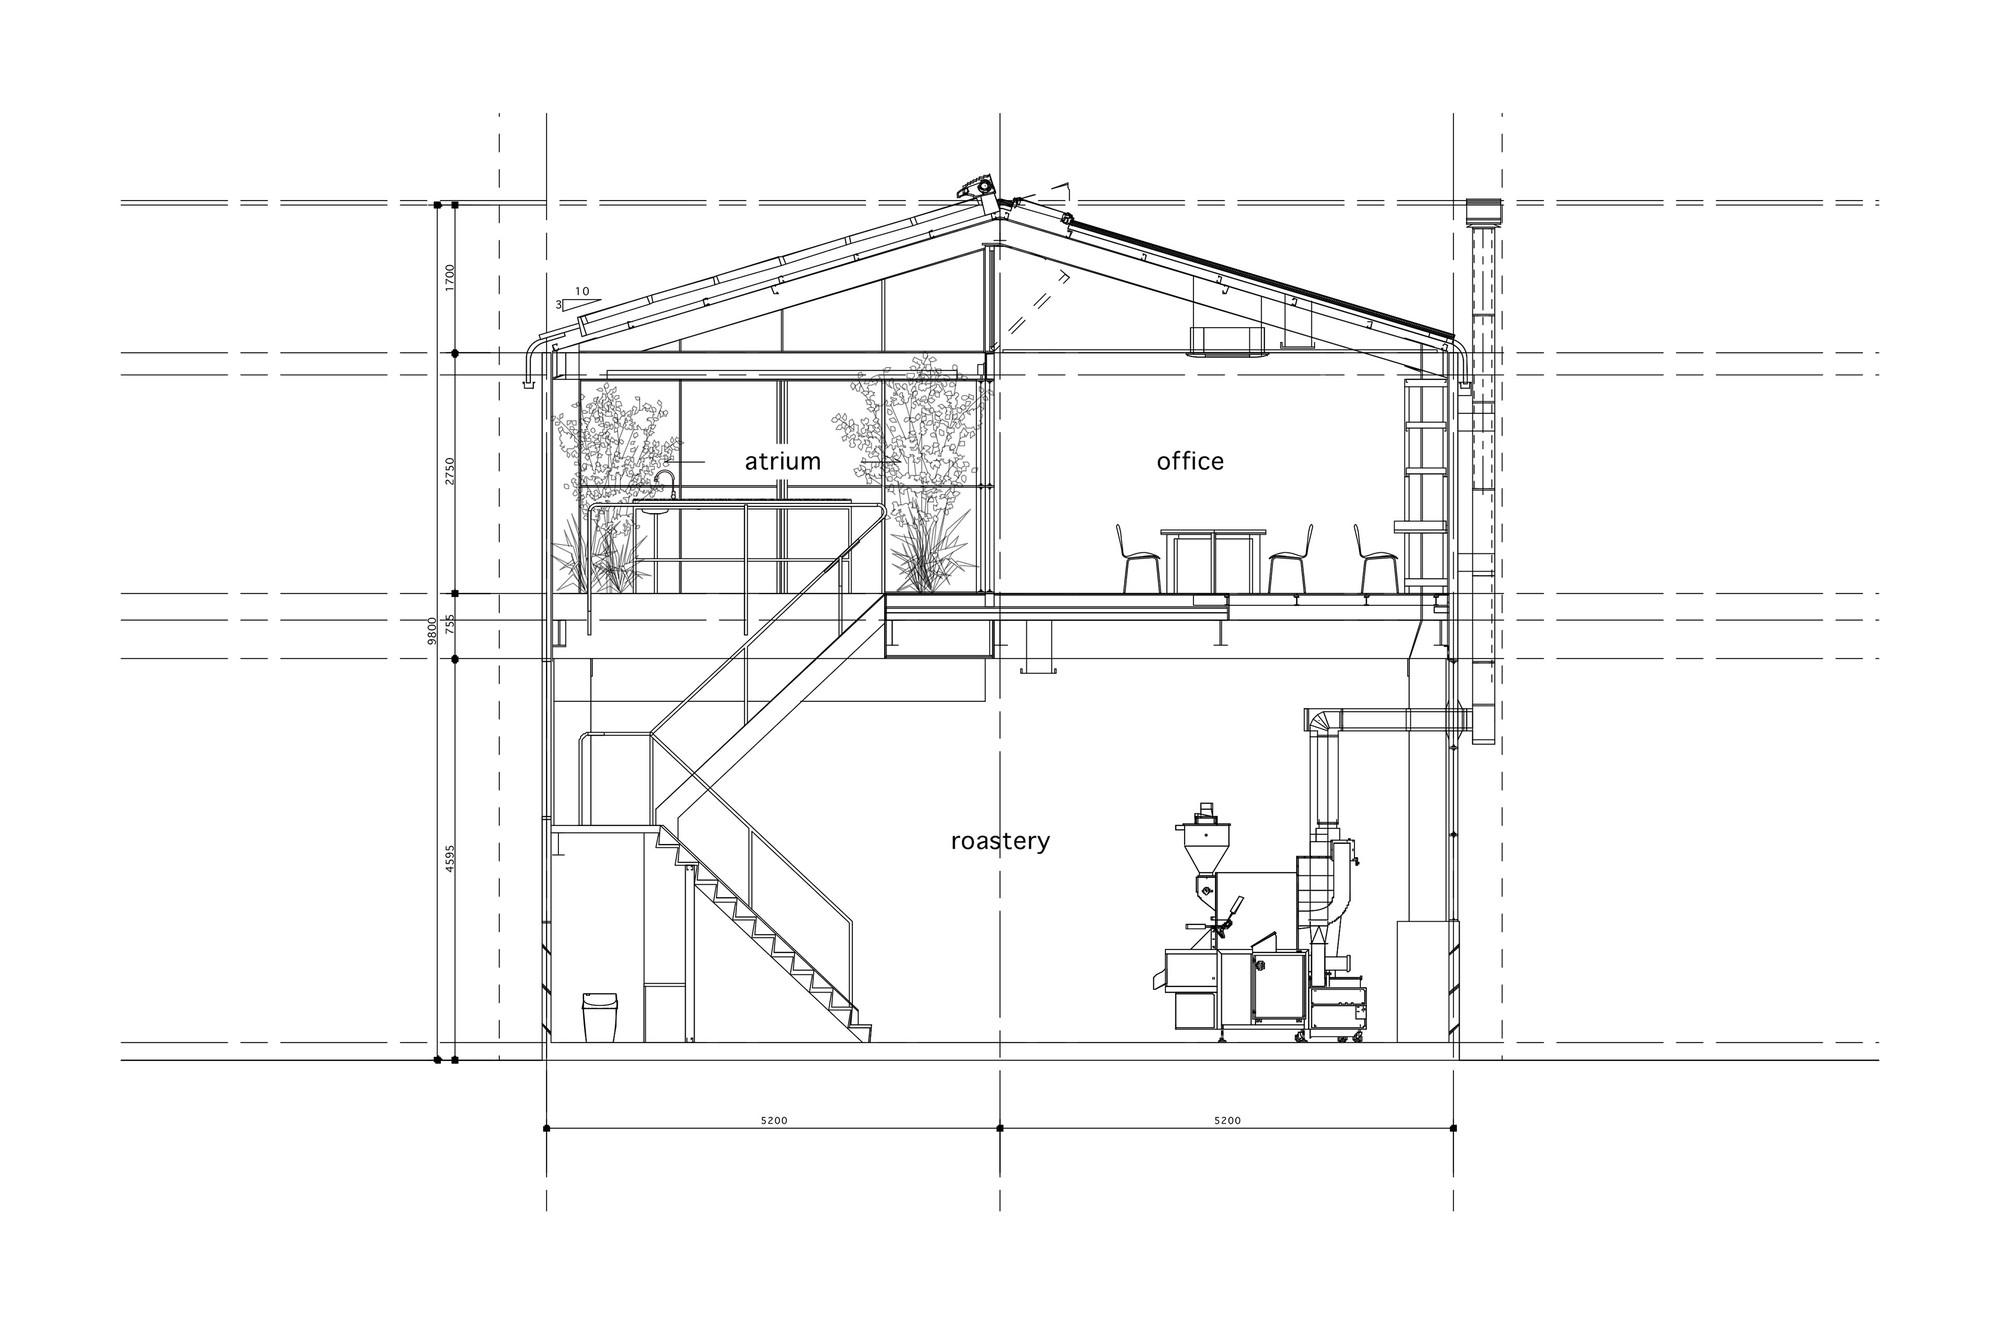 5275c5a3e8e44ee8e1000870 Orillia Public Library Perkins Will Plan further Design Initiatives New Taipei City Museum Of Art 12 Second Flr Pln moreover LagunaCity besides 65891 also 5850d858e58ece0202000133 Gad Park Gokhan Avcioglu Plus Gad Architecture Entrance Floor Plan. on floor plan design